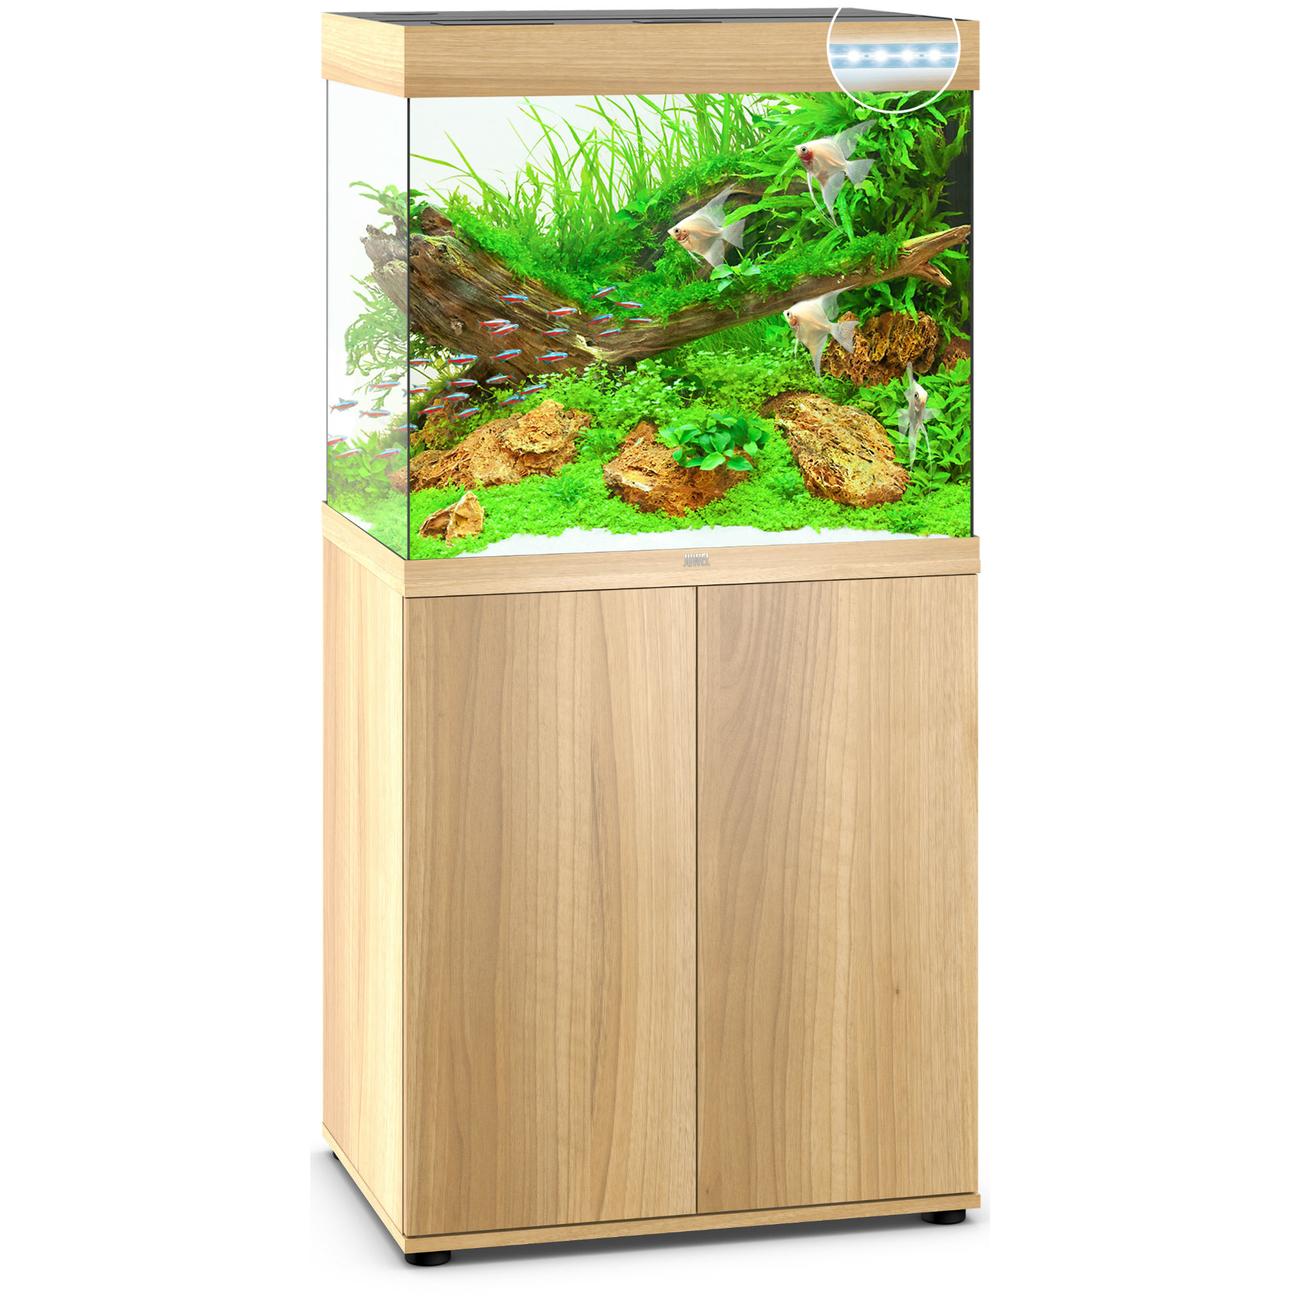 Juwel Lido 200 LED Aquarium mit Unterschrank, Bild 15